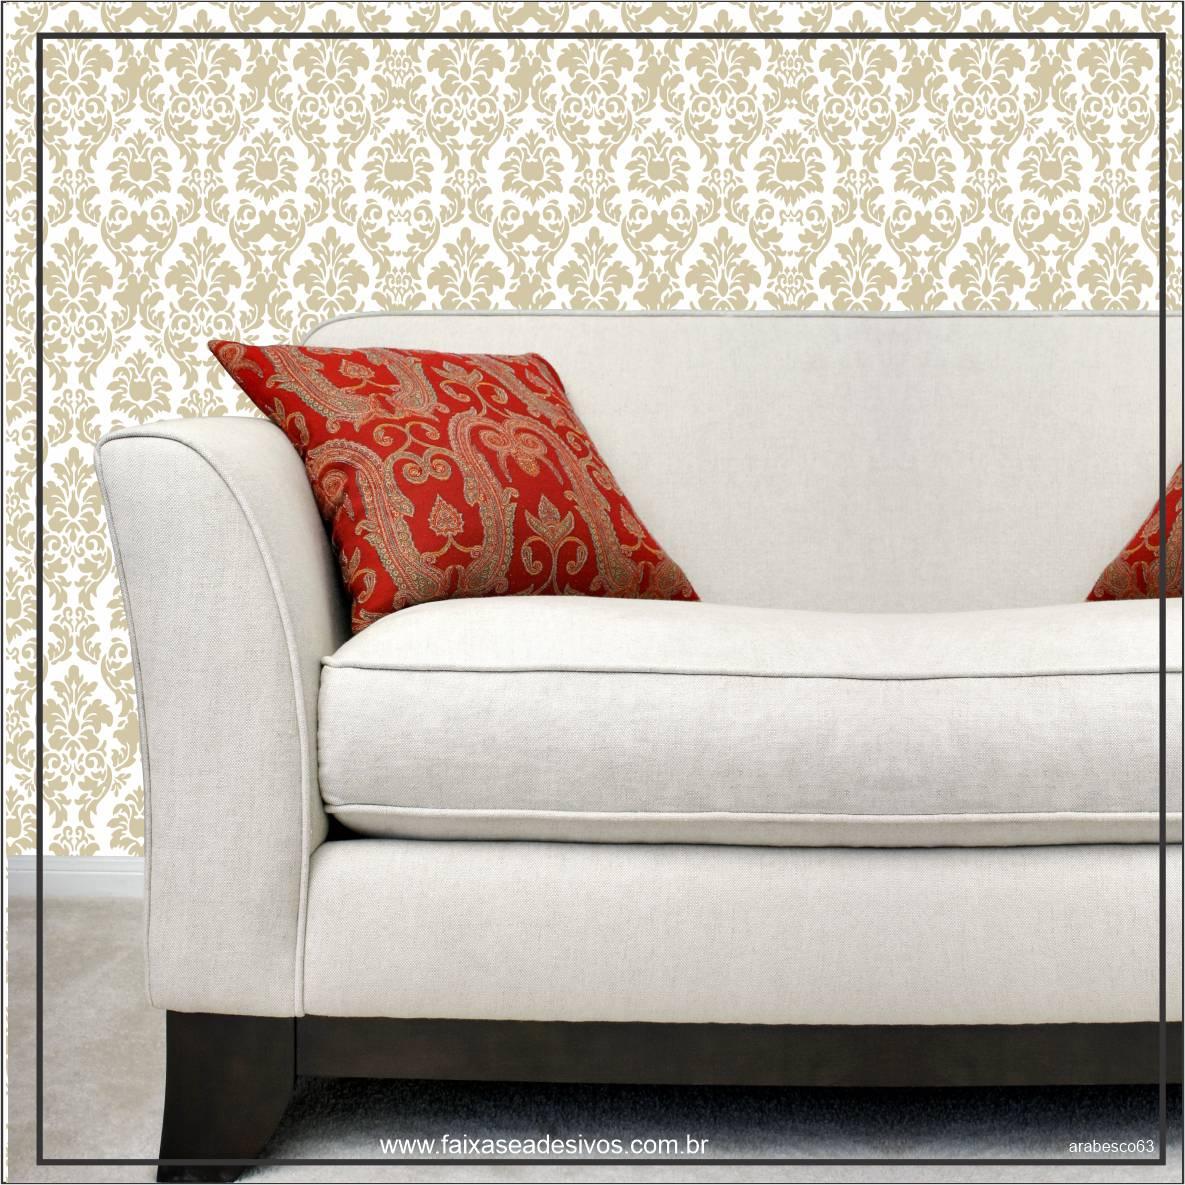 038 - Adesivo Decorativo de parede arabesco dourado - 58cm larg  - Fac Signs